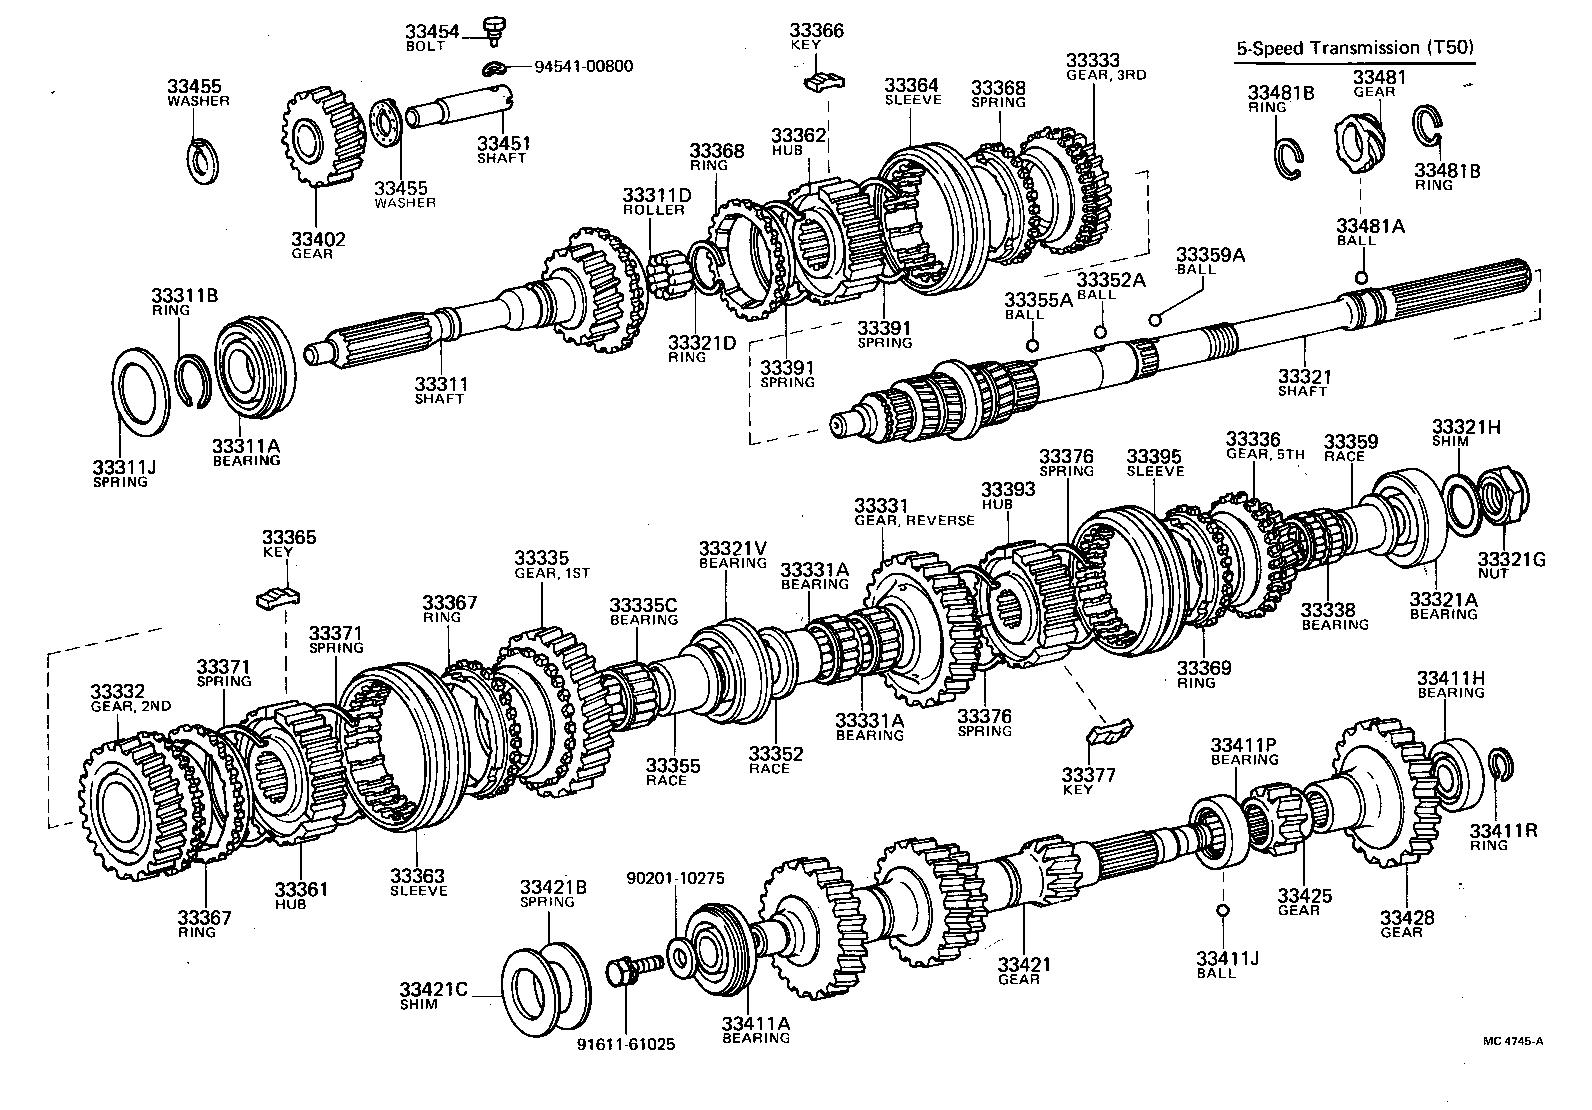 toyota corolla truenote47l mqzg powertrain chassis transmission rh japan parts eu 1995 toyota corolla transmission diagram toyota corolla automatic transmission diagram